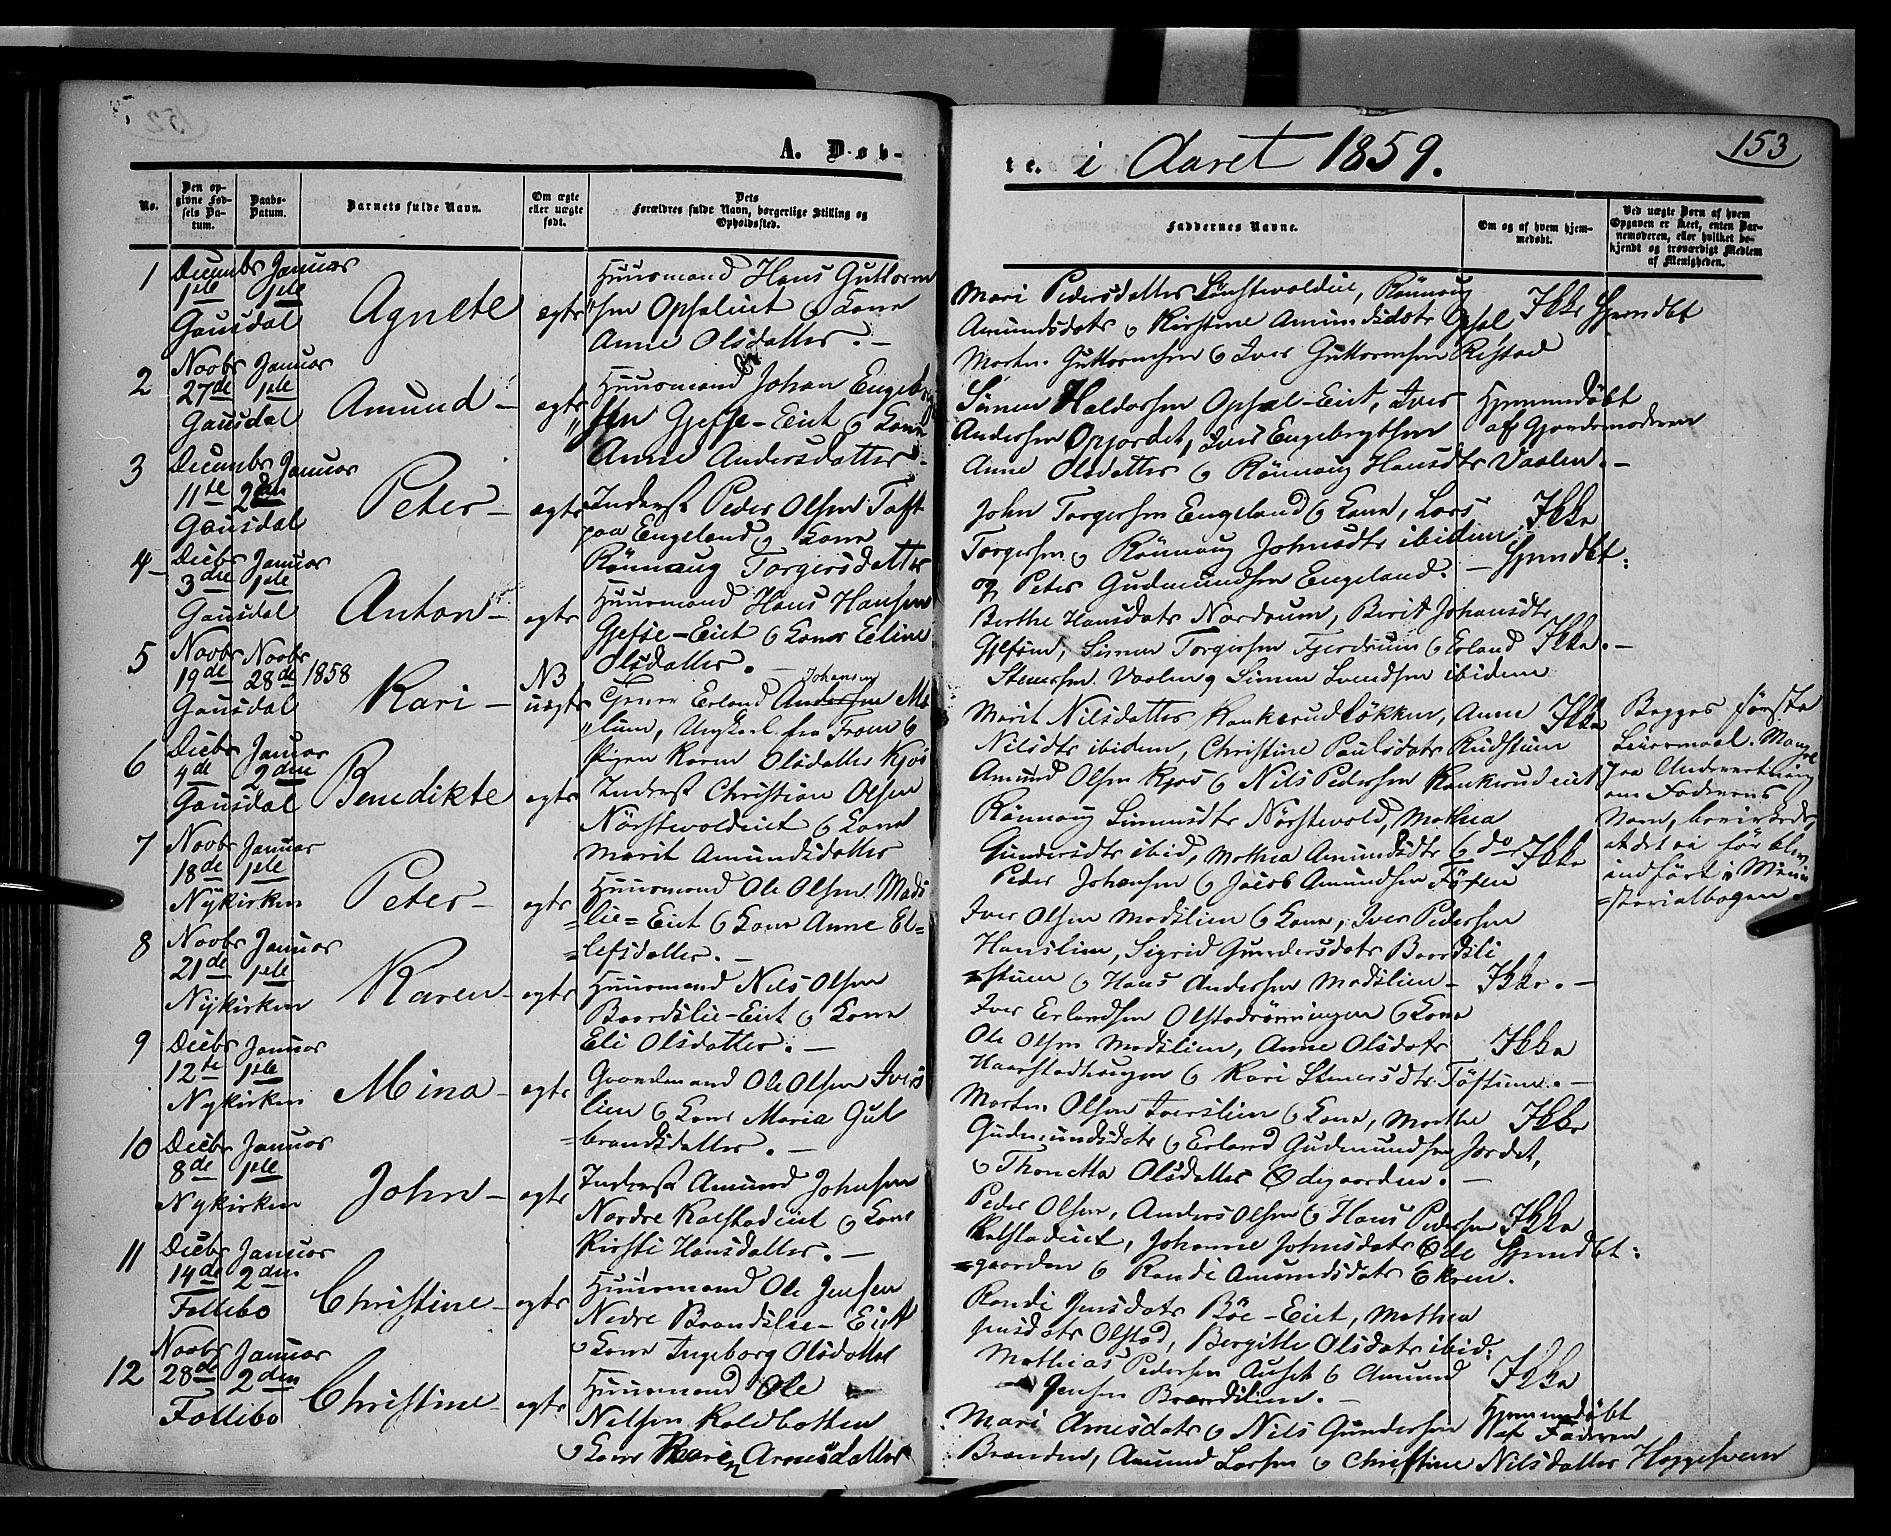 SAH, Gausdal prestekontor, Ministerialbok nr. 8, 1850-1861, s. 153